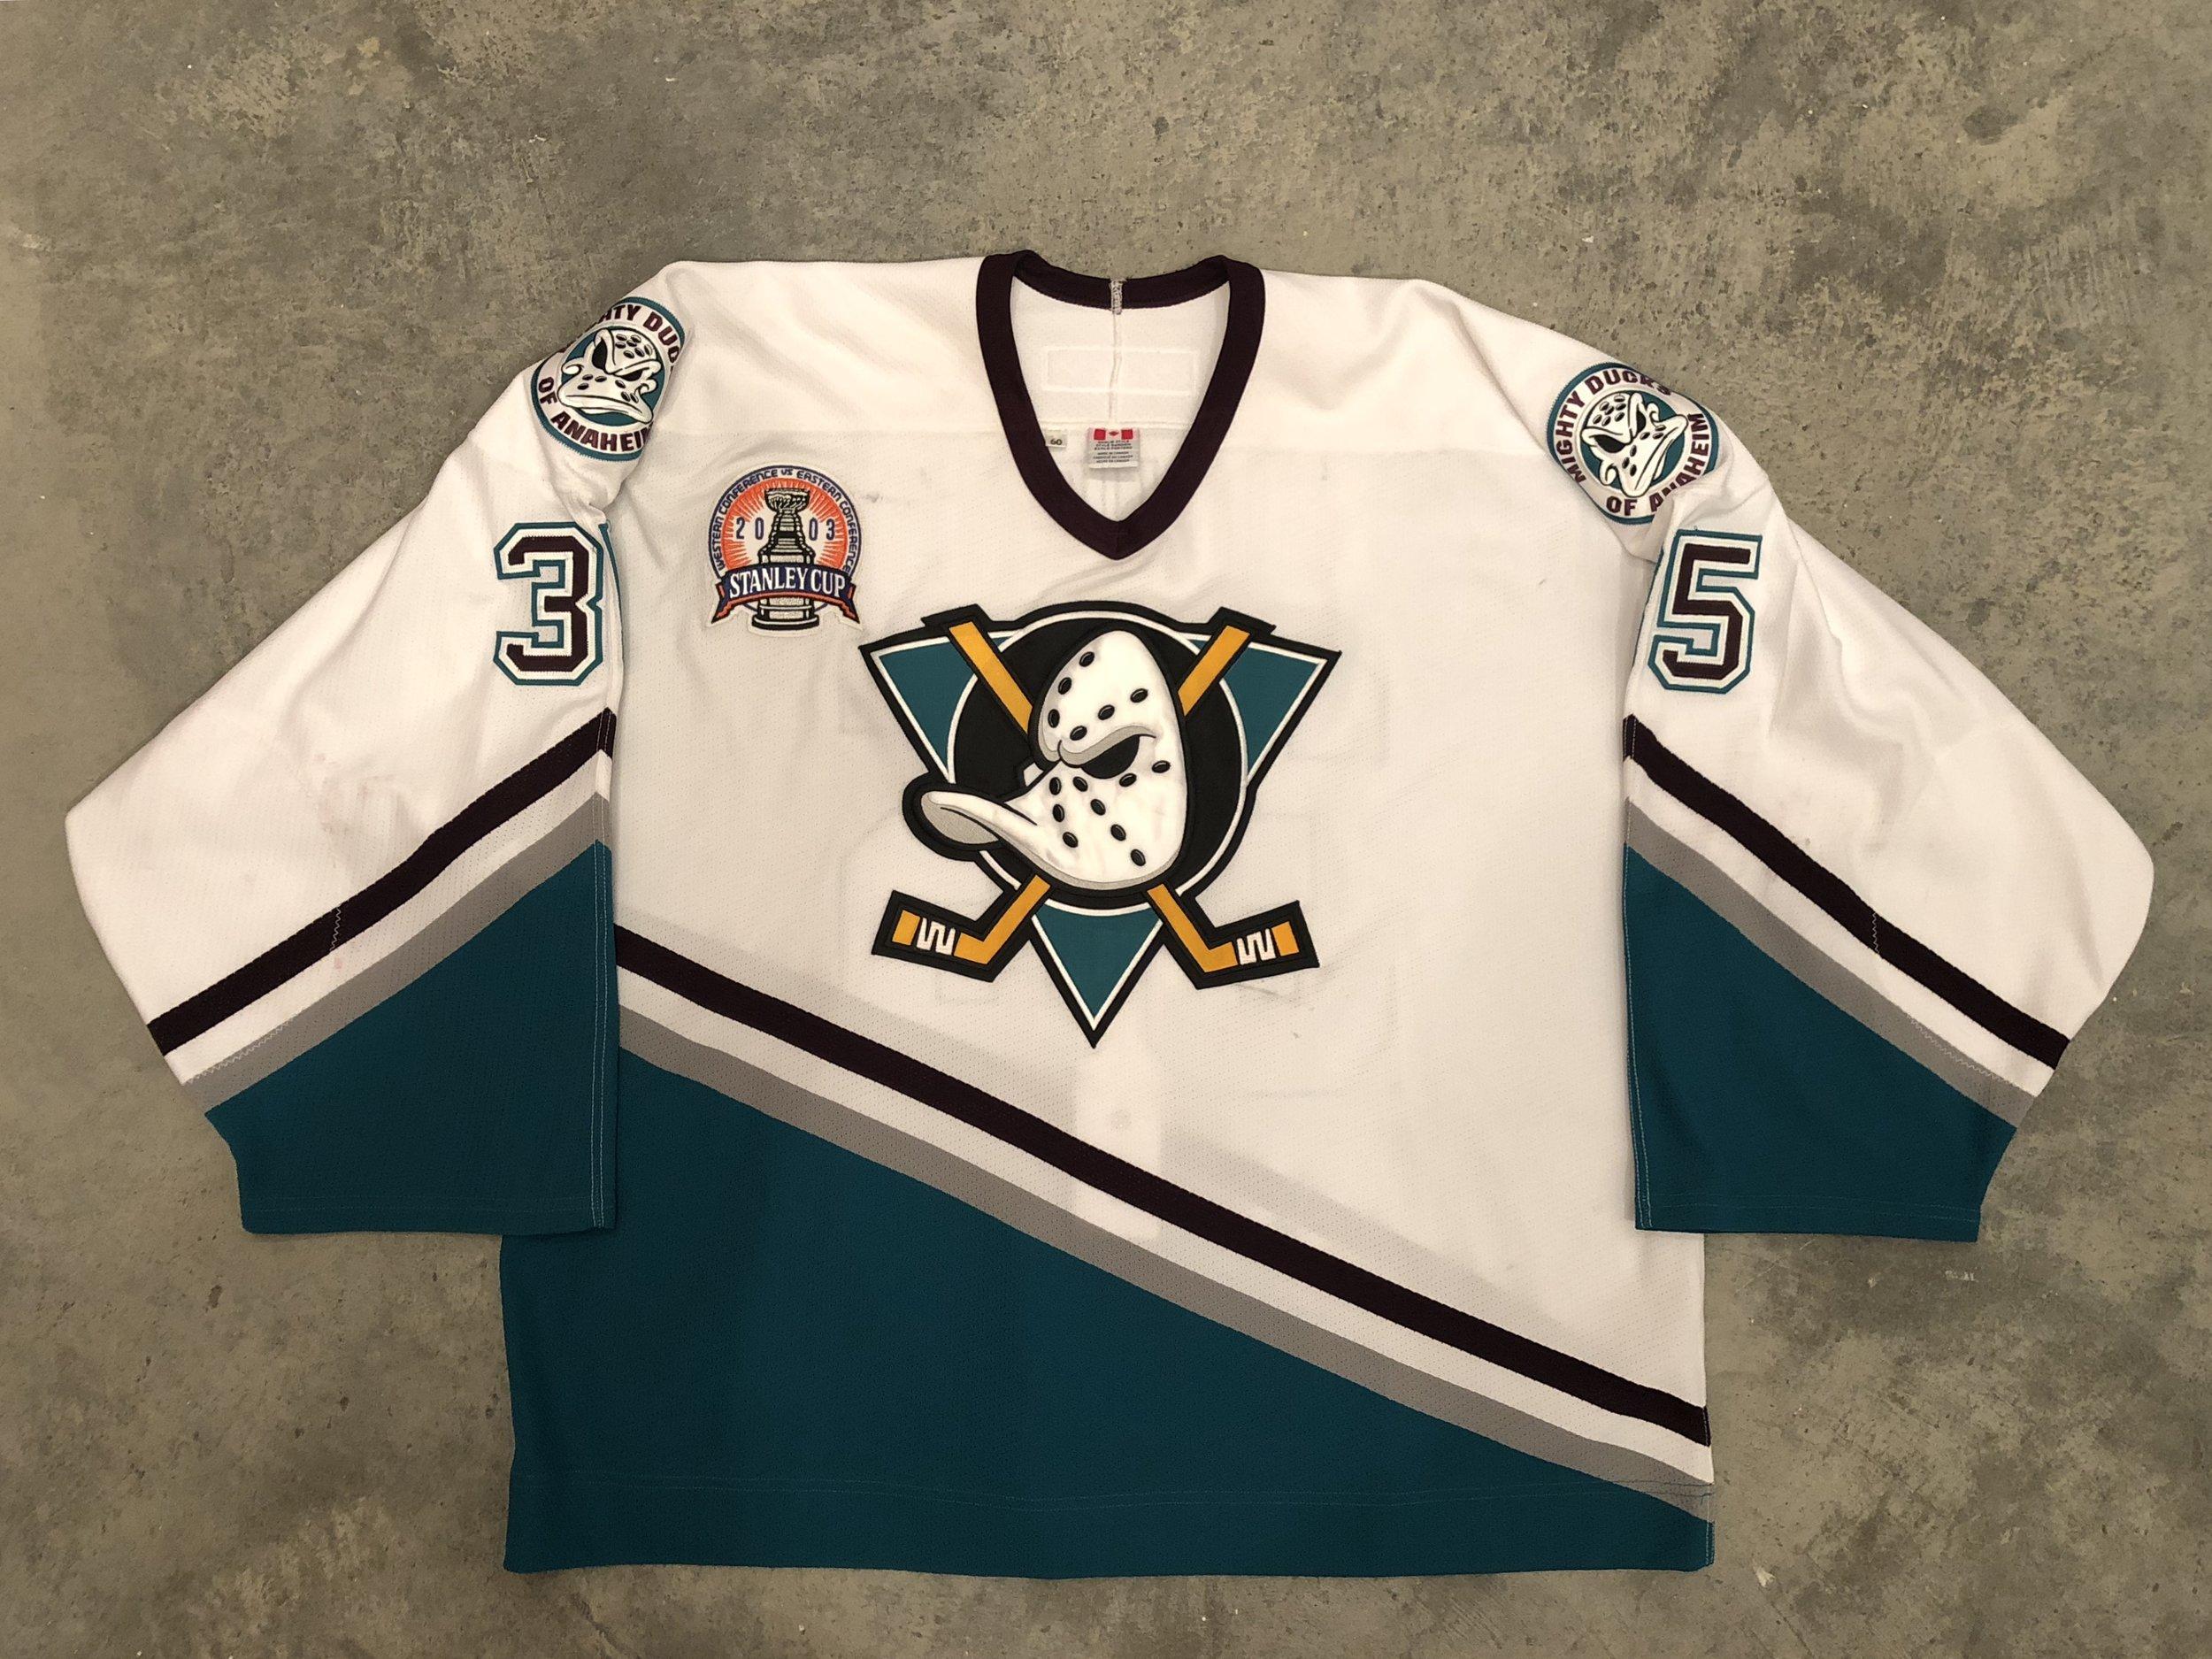 2003 Anaheim Might Ducks Stanley Cup Finals Game Worn Home Jersey - JS Giguere - Conn Smythe Winner